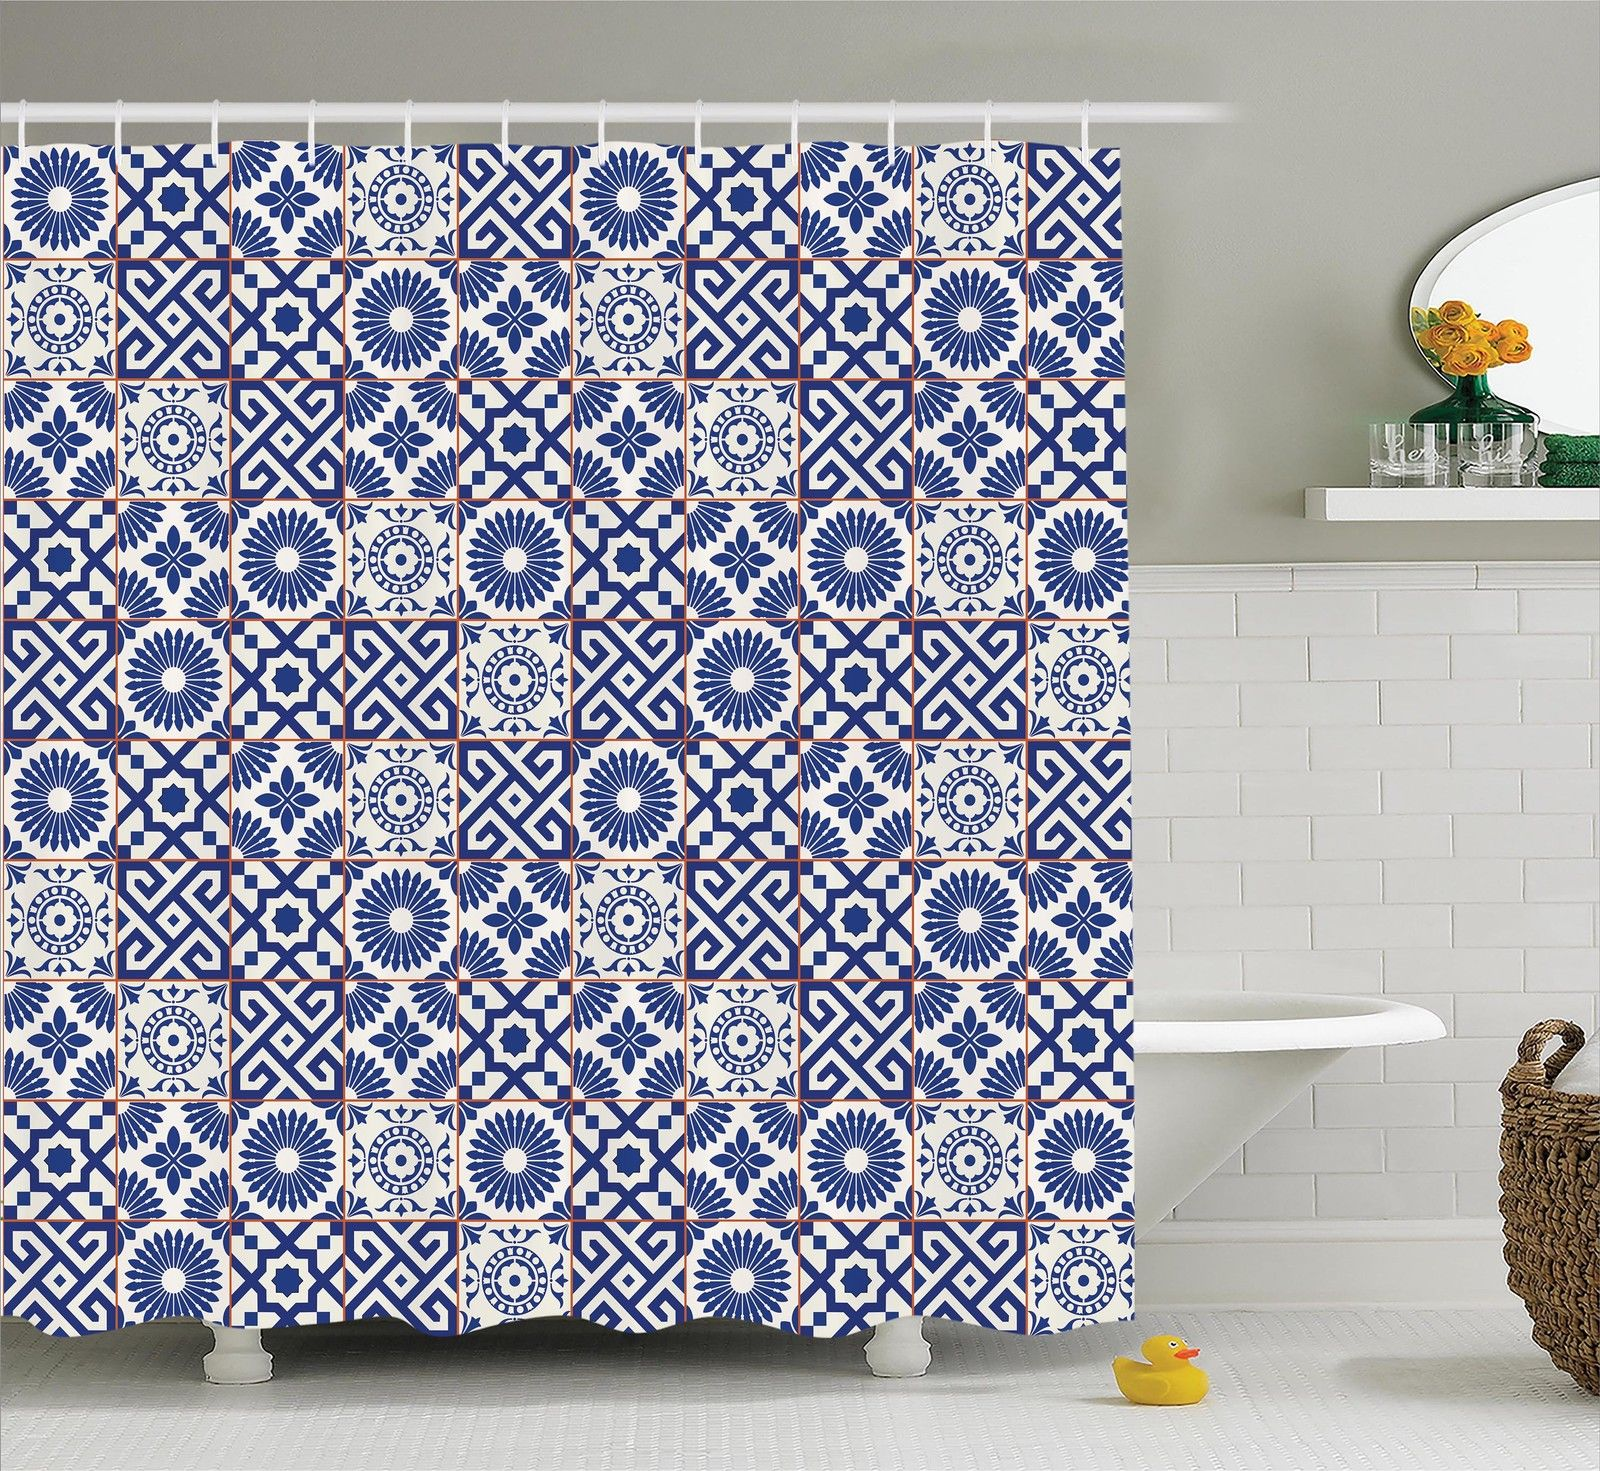 Moroccan Mosaic Tiles Pattern Folk Art Style Modern Print Shower Curtain Set Ebay